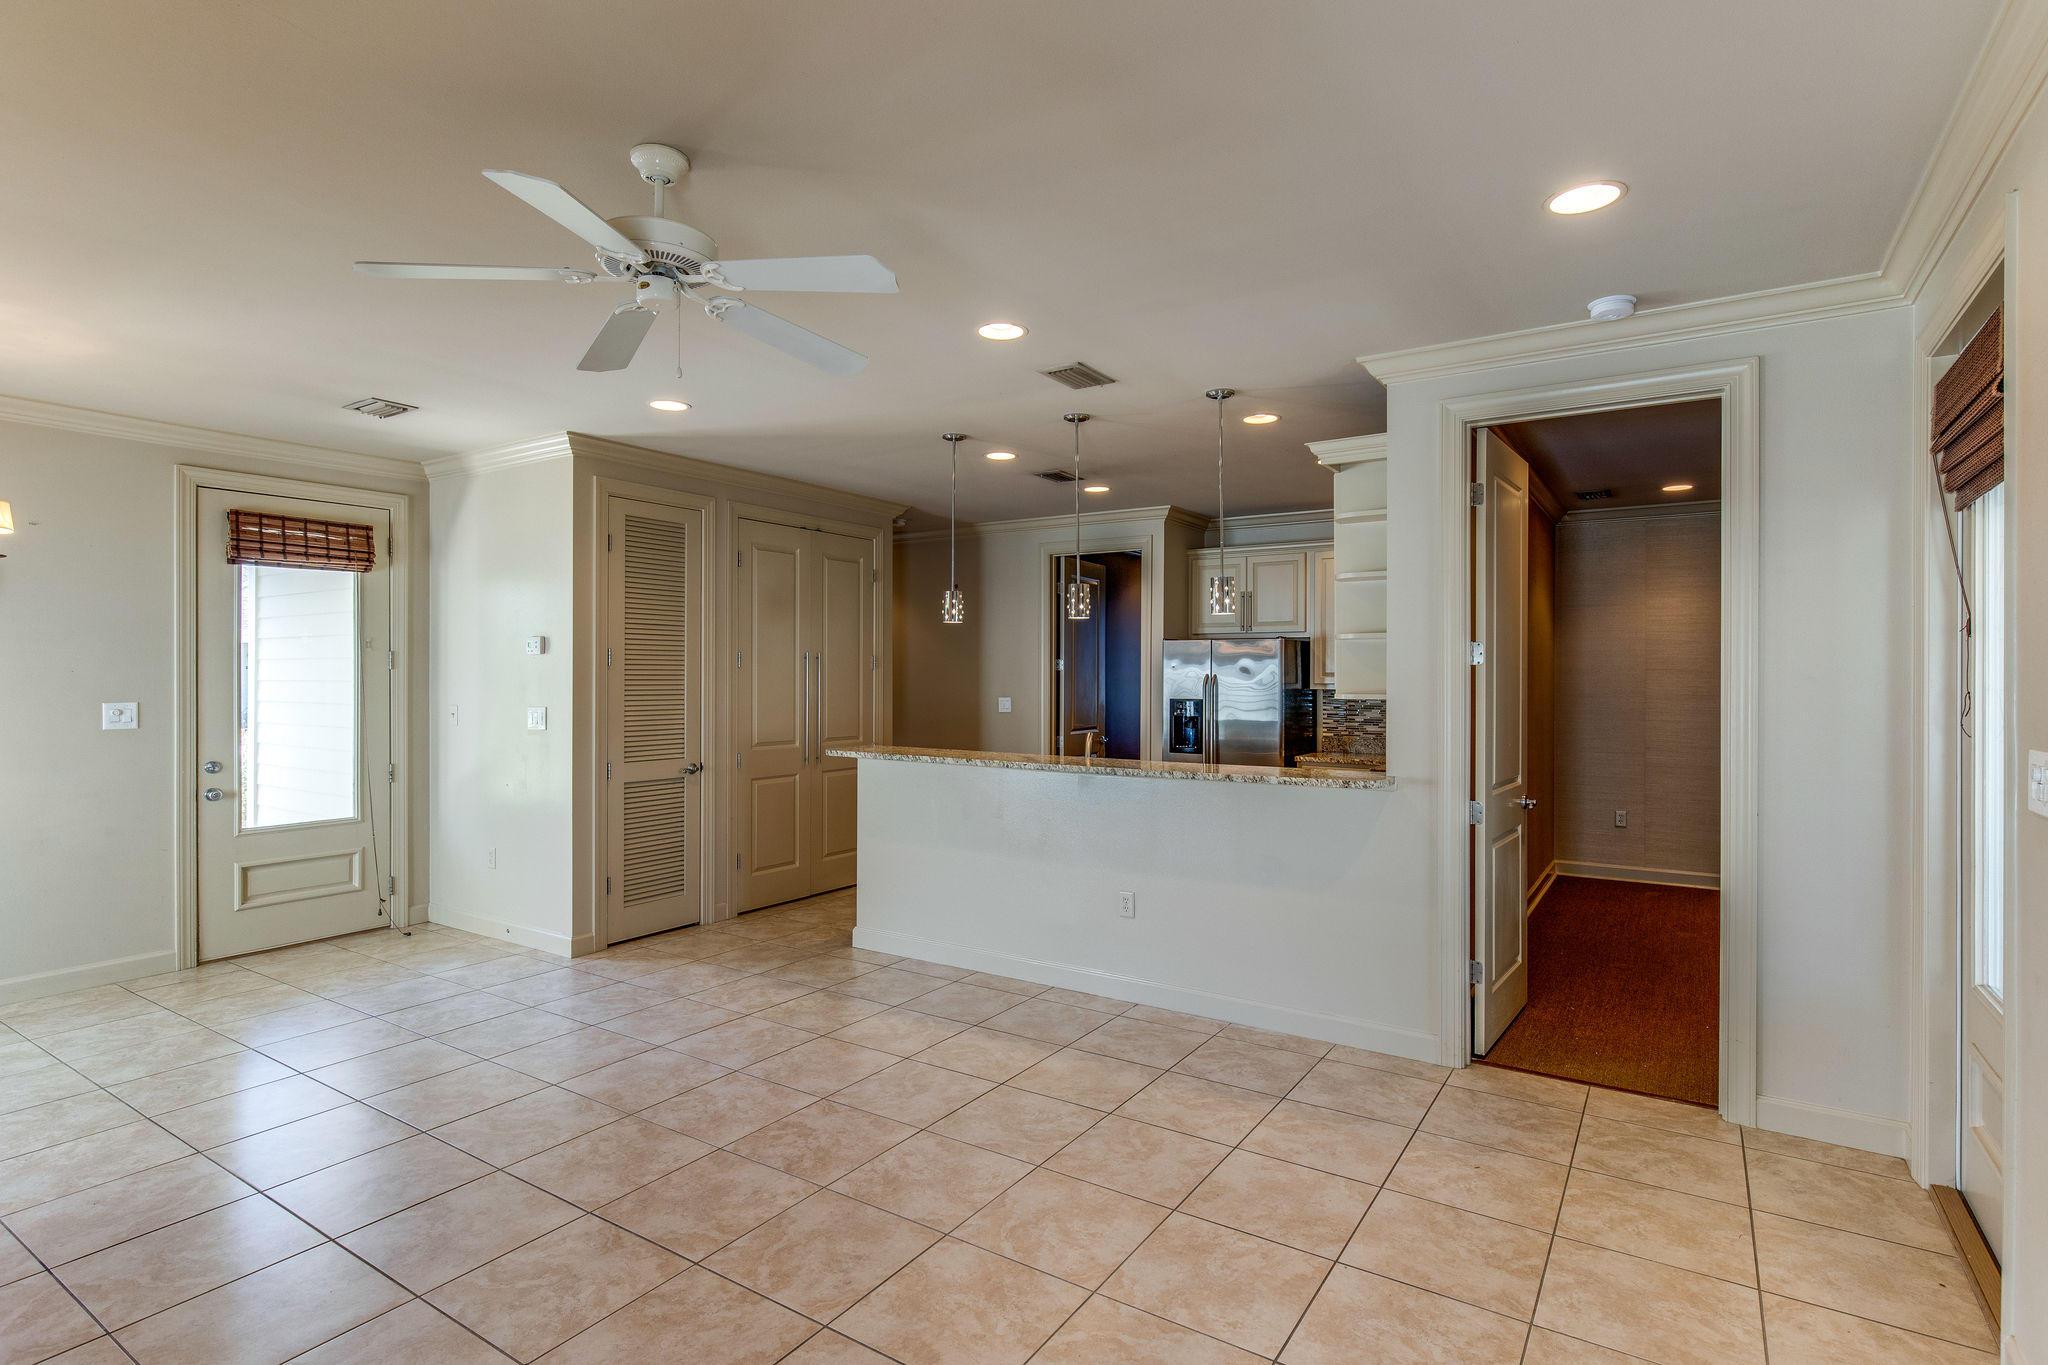 110 S Zander Way, Santa Rosa Beach, FL 32459 (MLS# 821142